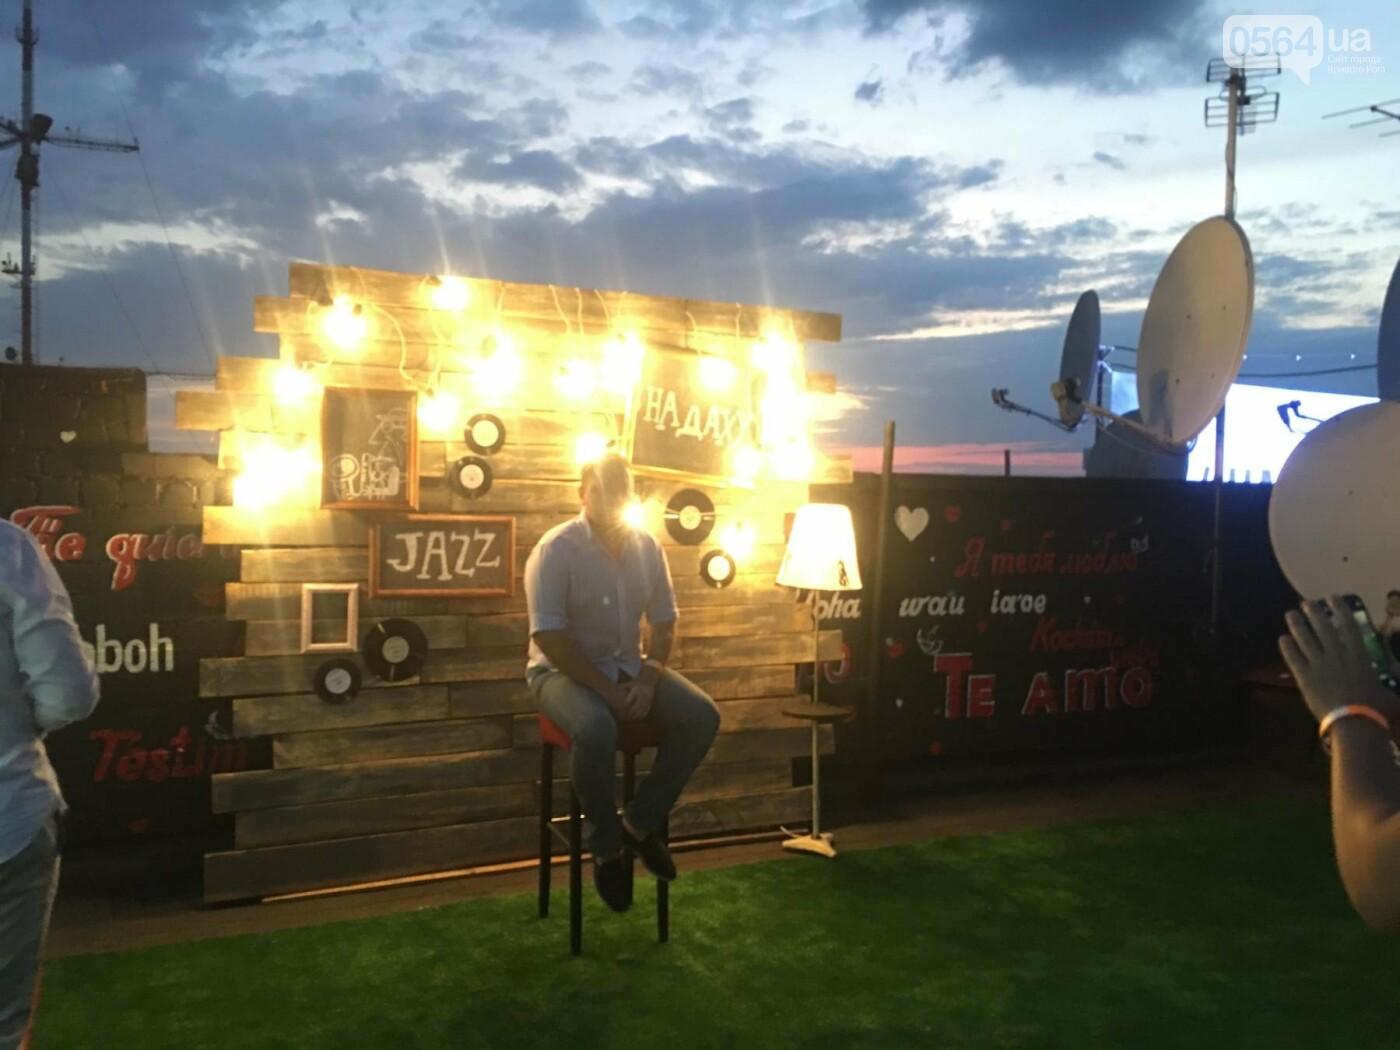 Сотни криворожан встречали закат на крыше отеля под мелодии джаза, - ФОТО, ВИДЕО, фото-33